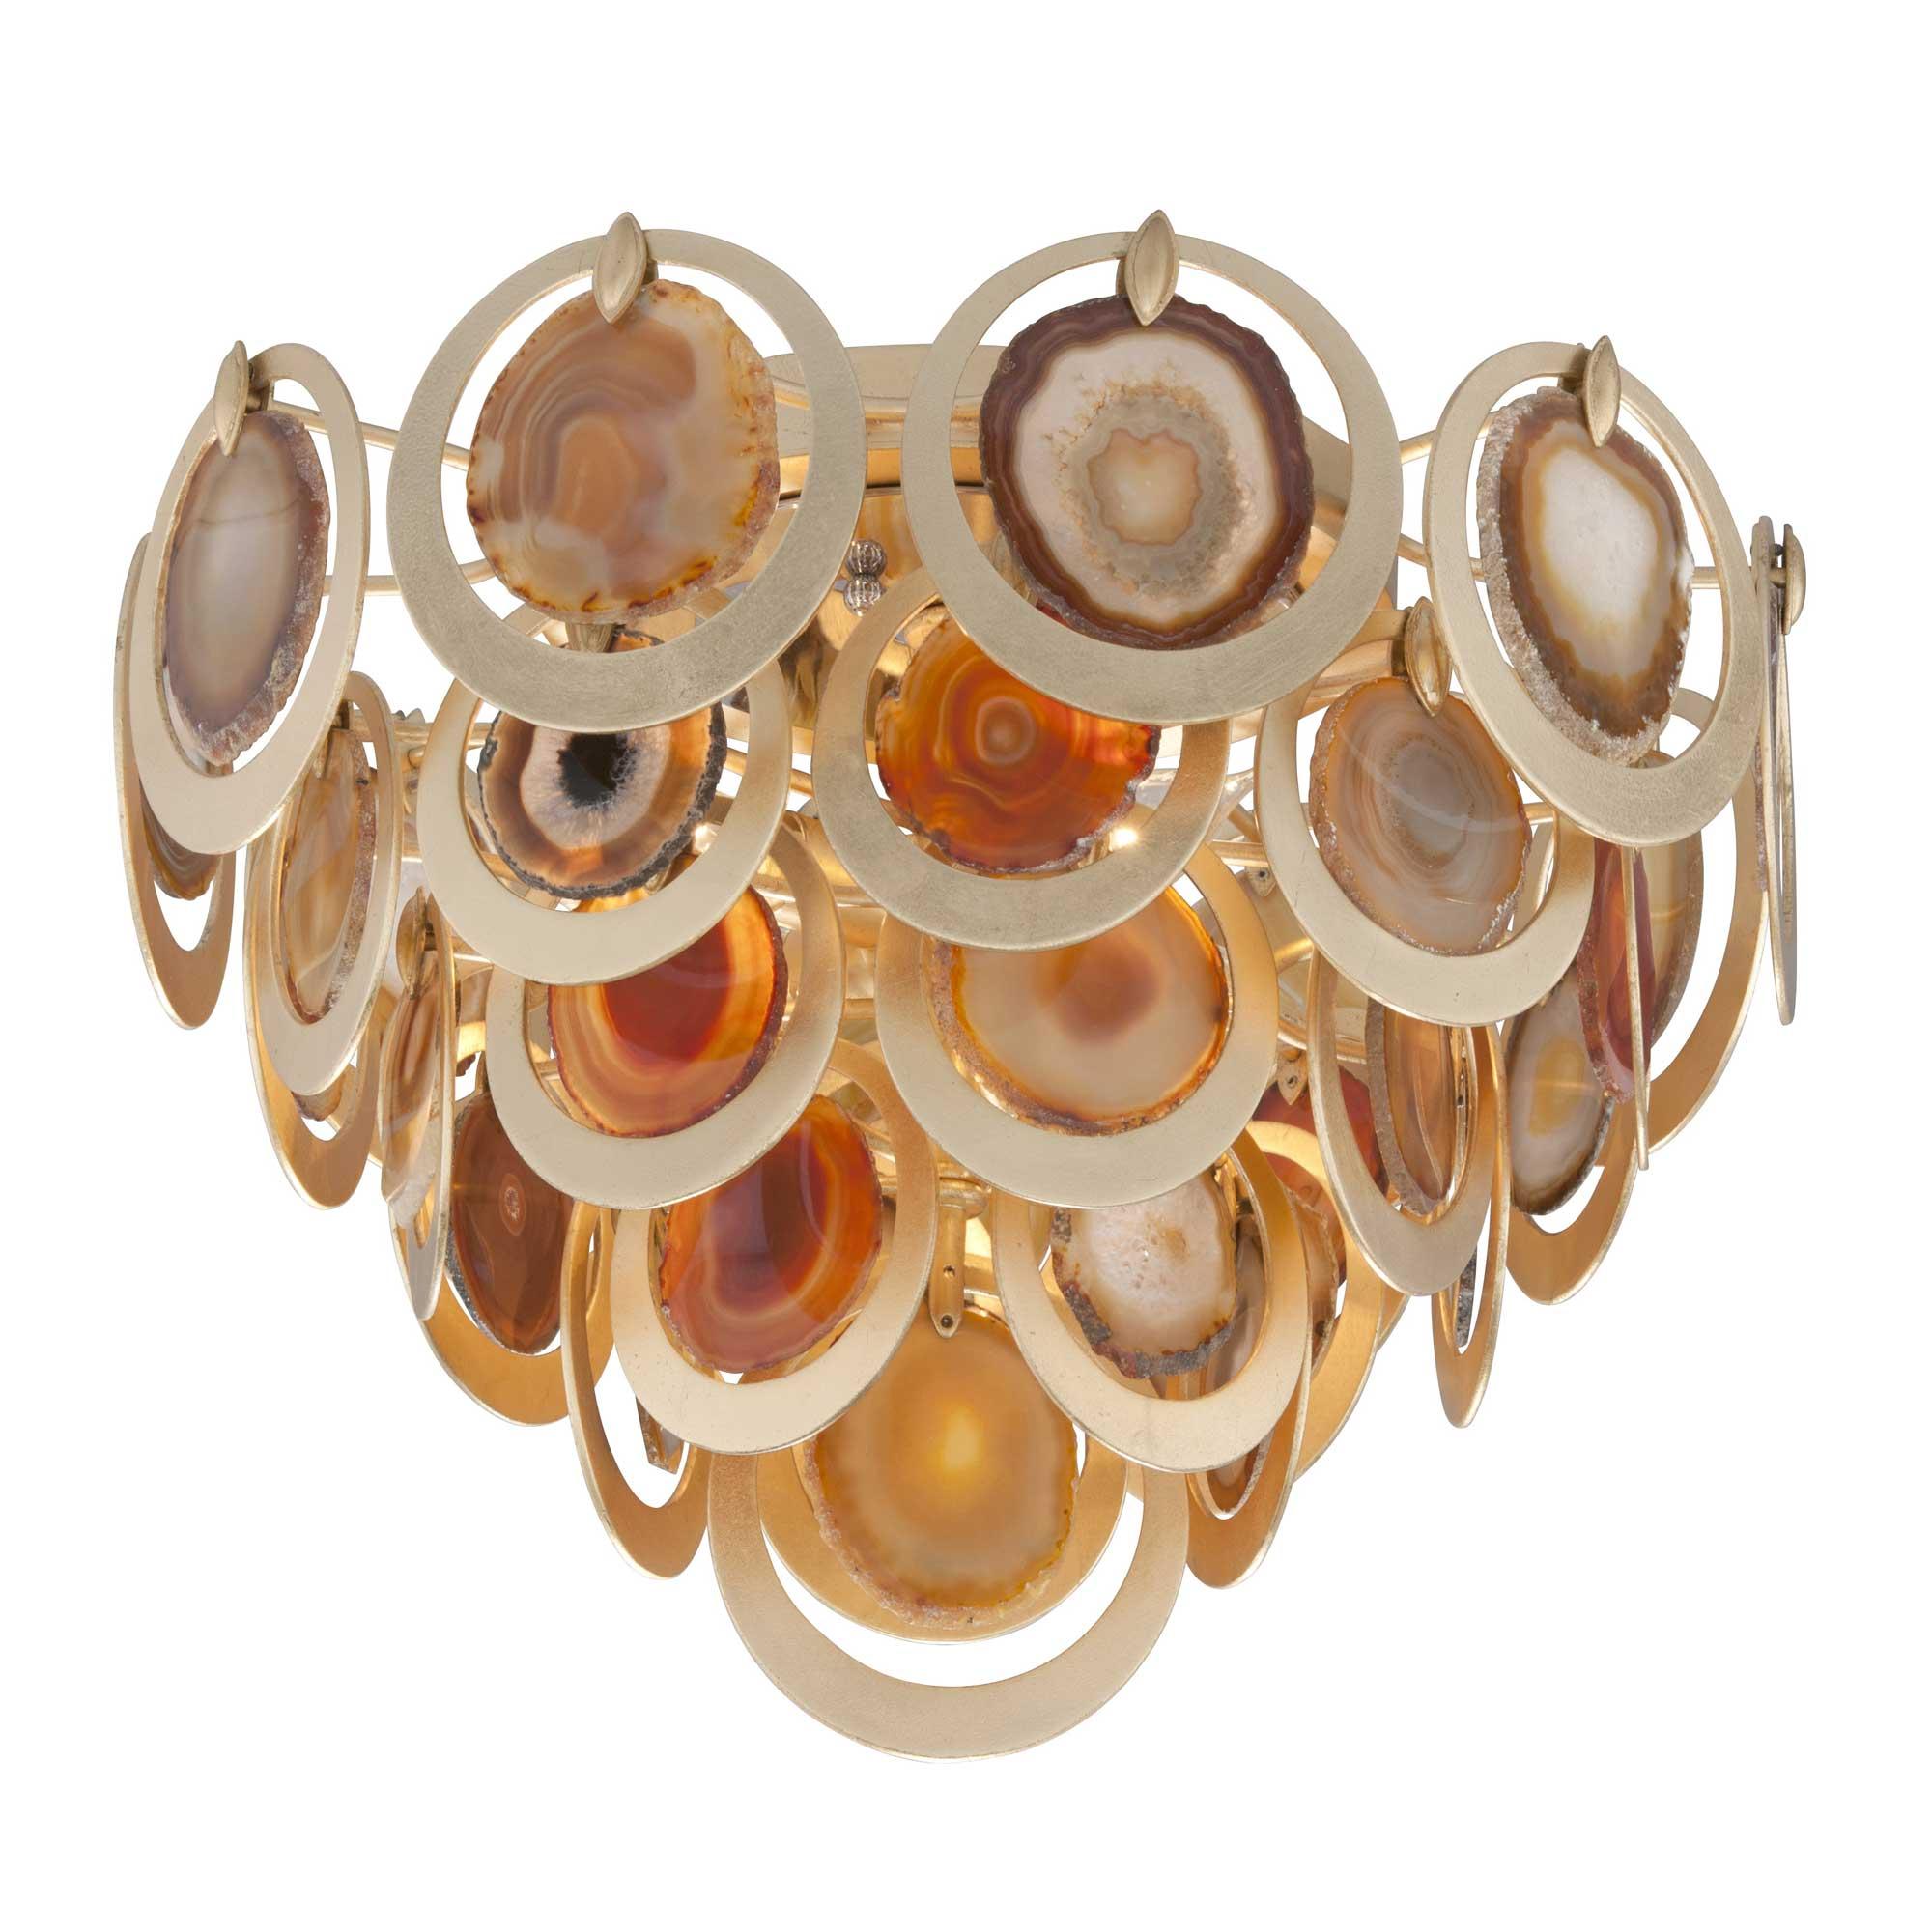 lumen lights mount ceiling fixture fixtures feit electric type inch light flushmount ceilings led flush bulb